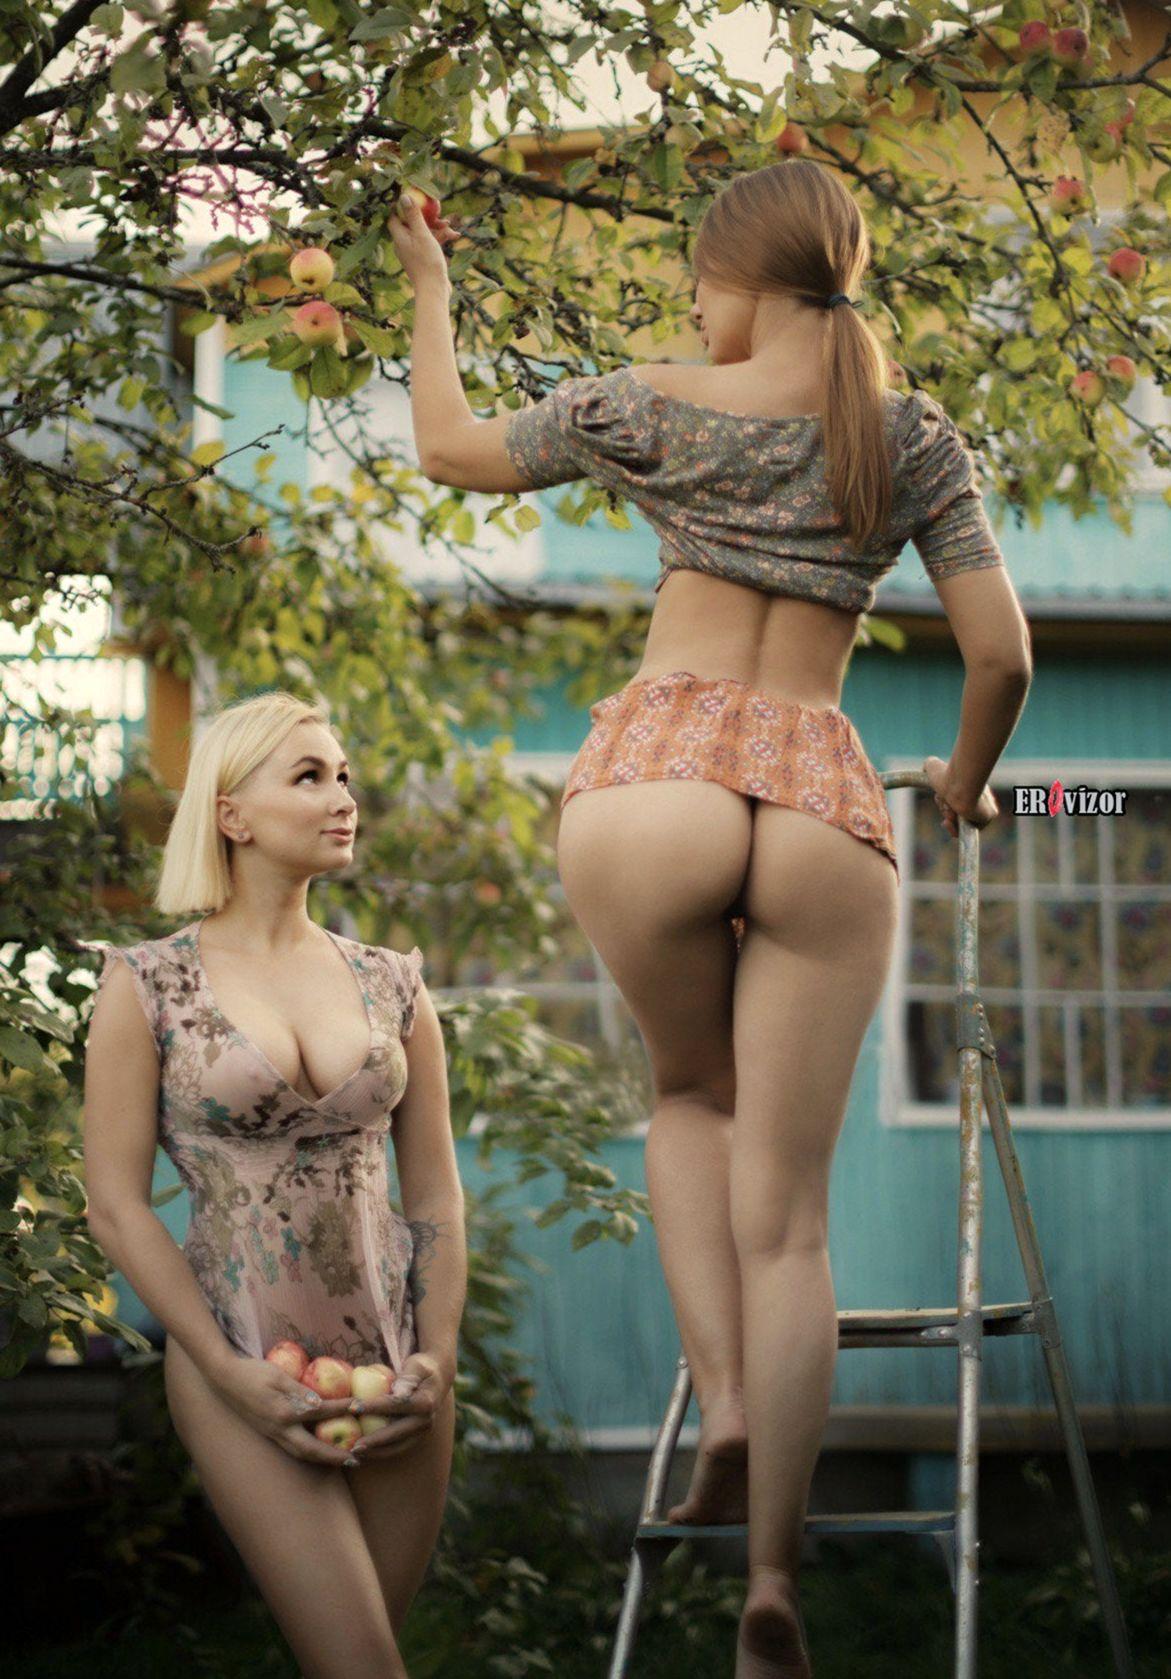 эро фото девушки в саду собирают яблоки